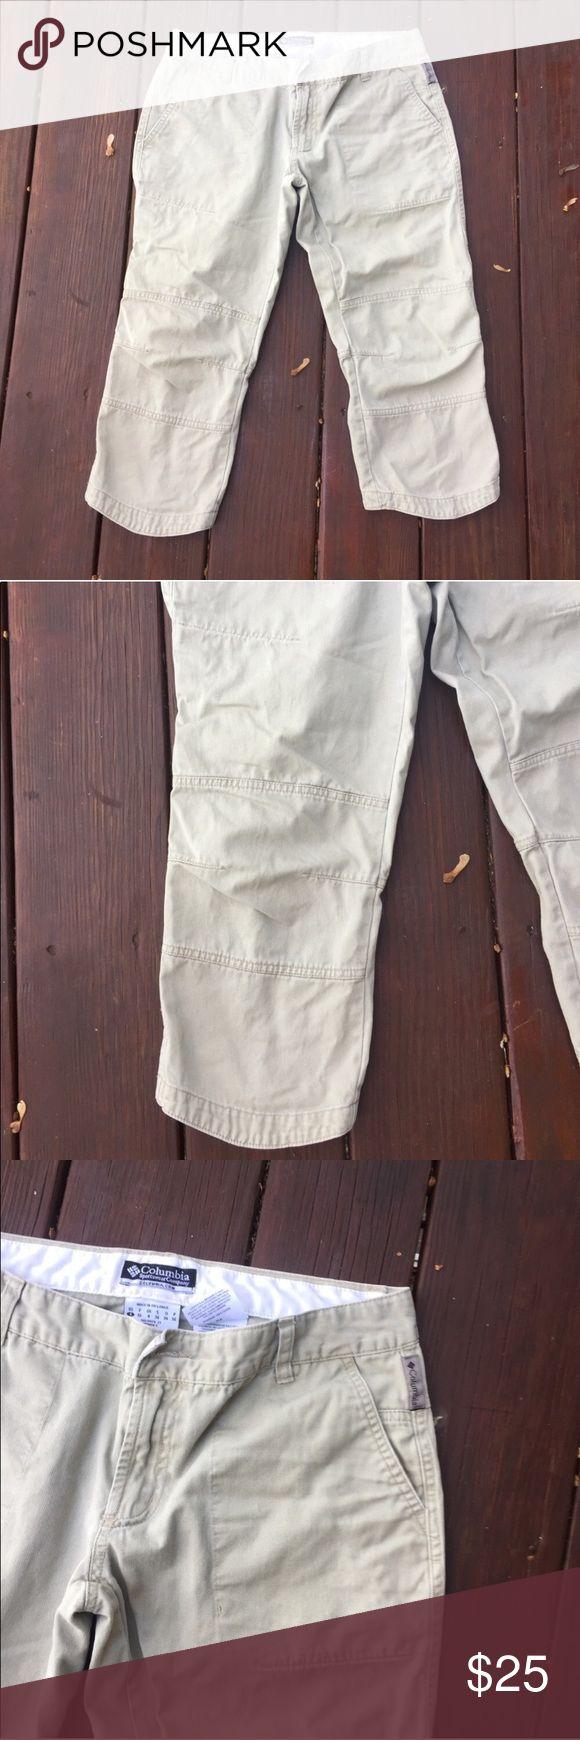 ☀️EUC Columbia Sportswear Capri Khaki Cargo Pants Columbia Sportswear Capri Khaki Cargo Pants, tan/cream, size 4, in excellent condition Columbia Pants Capris